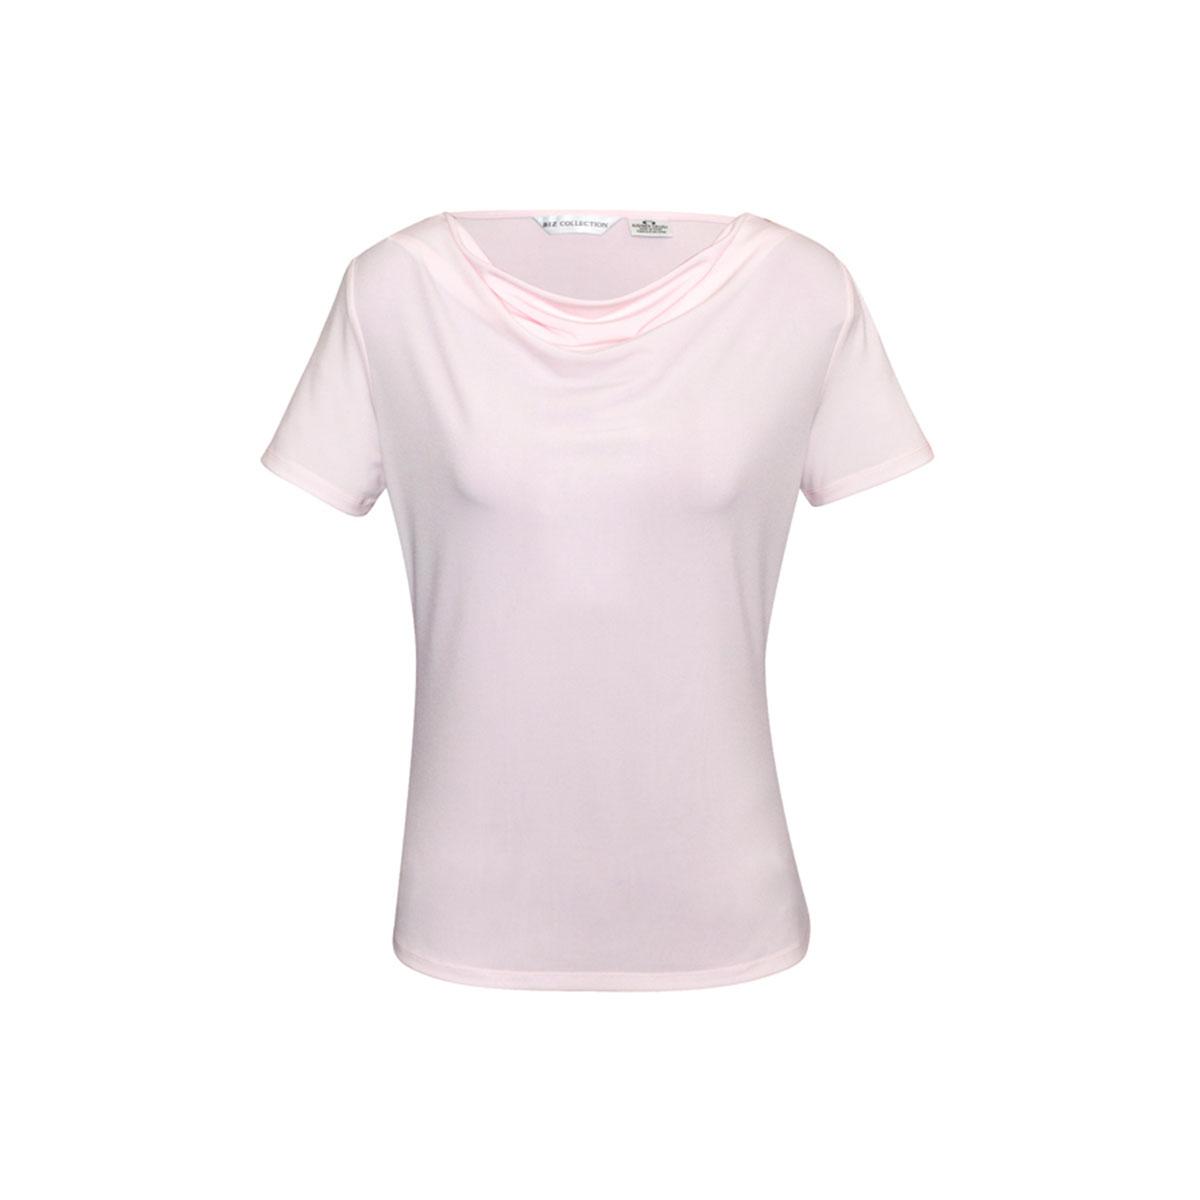 Ladies Ava Drape Knit Top-Blush Pink